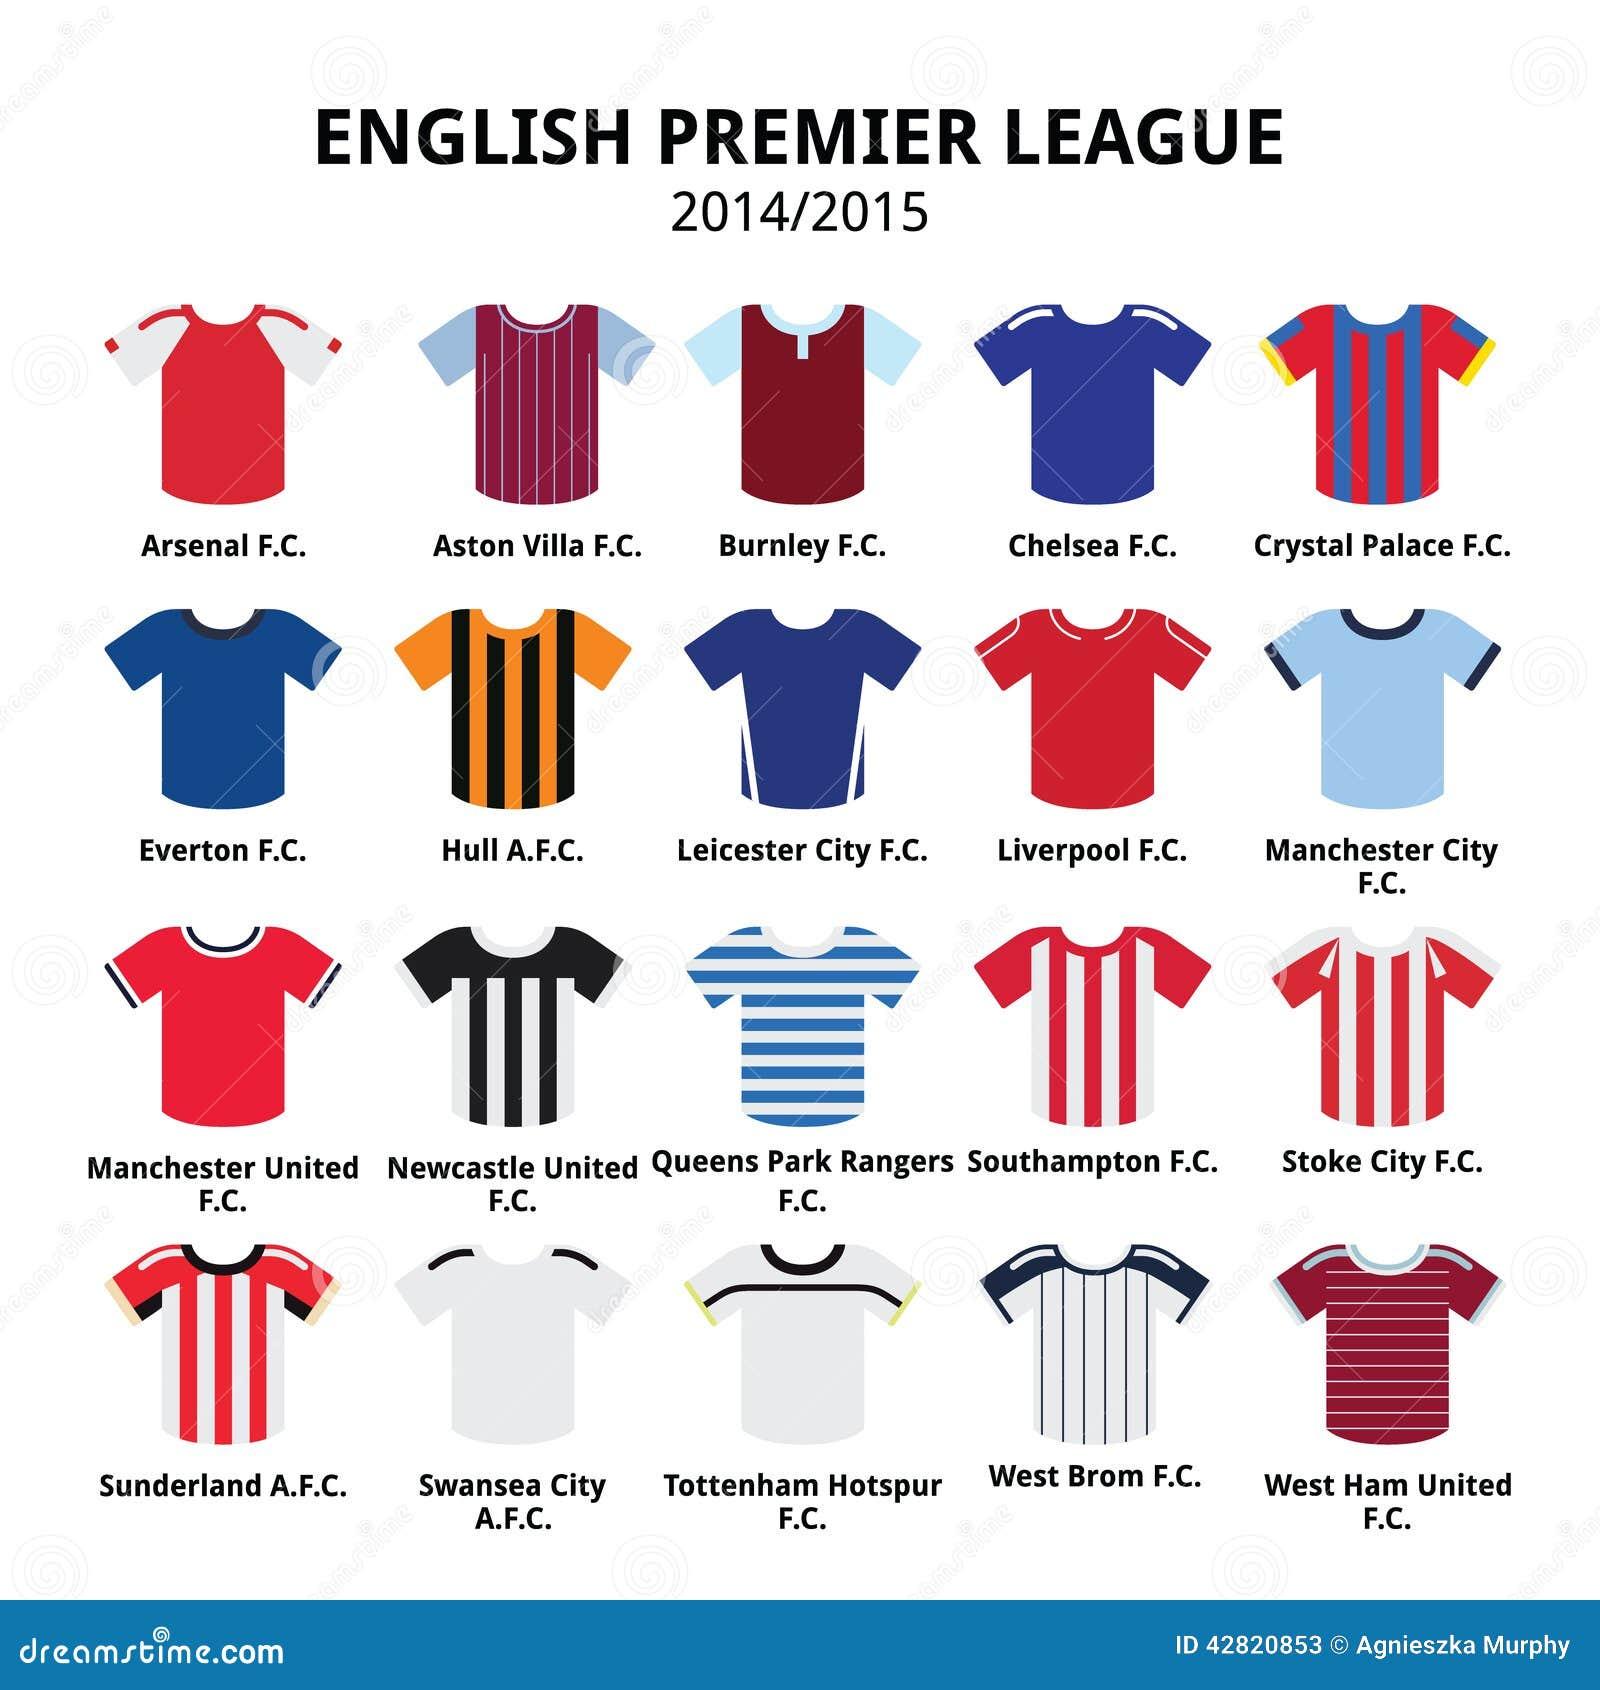 03c7ea0df9f English Premier League 2014 - 2015 football or soccer jerseys icons set